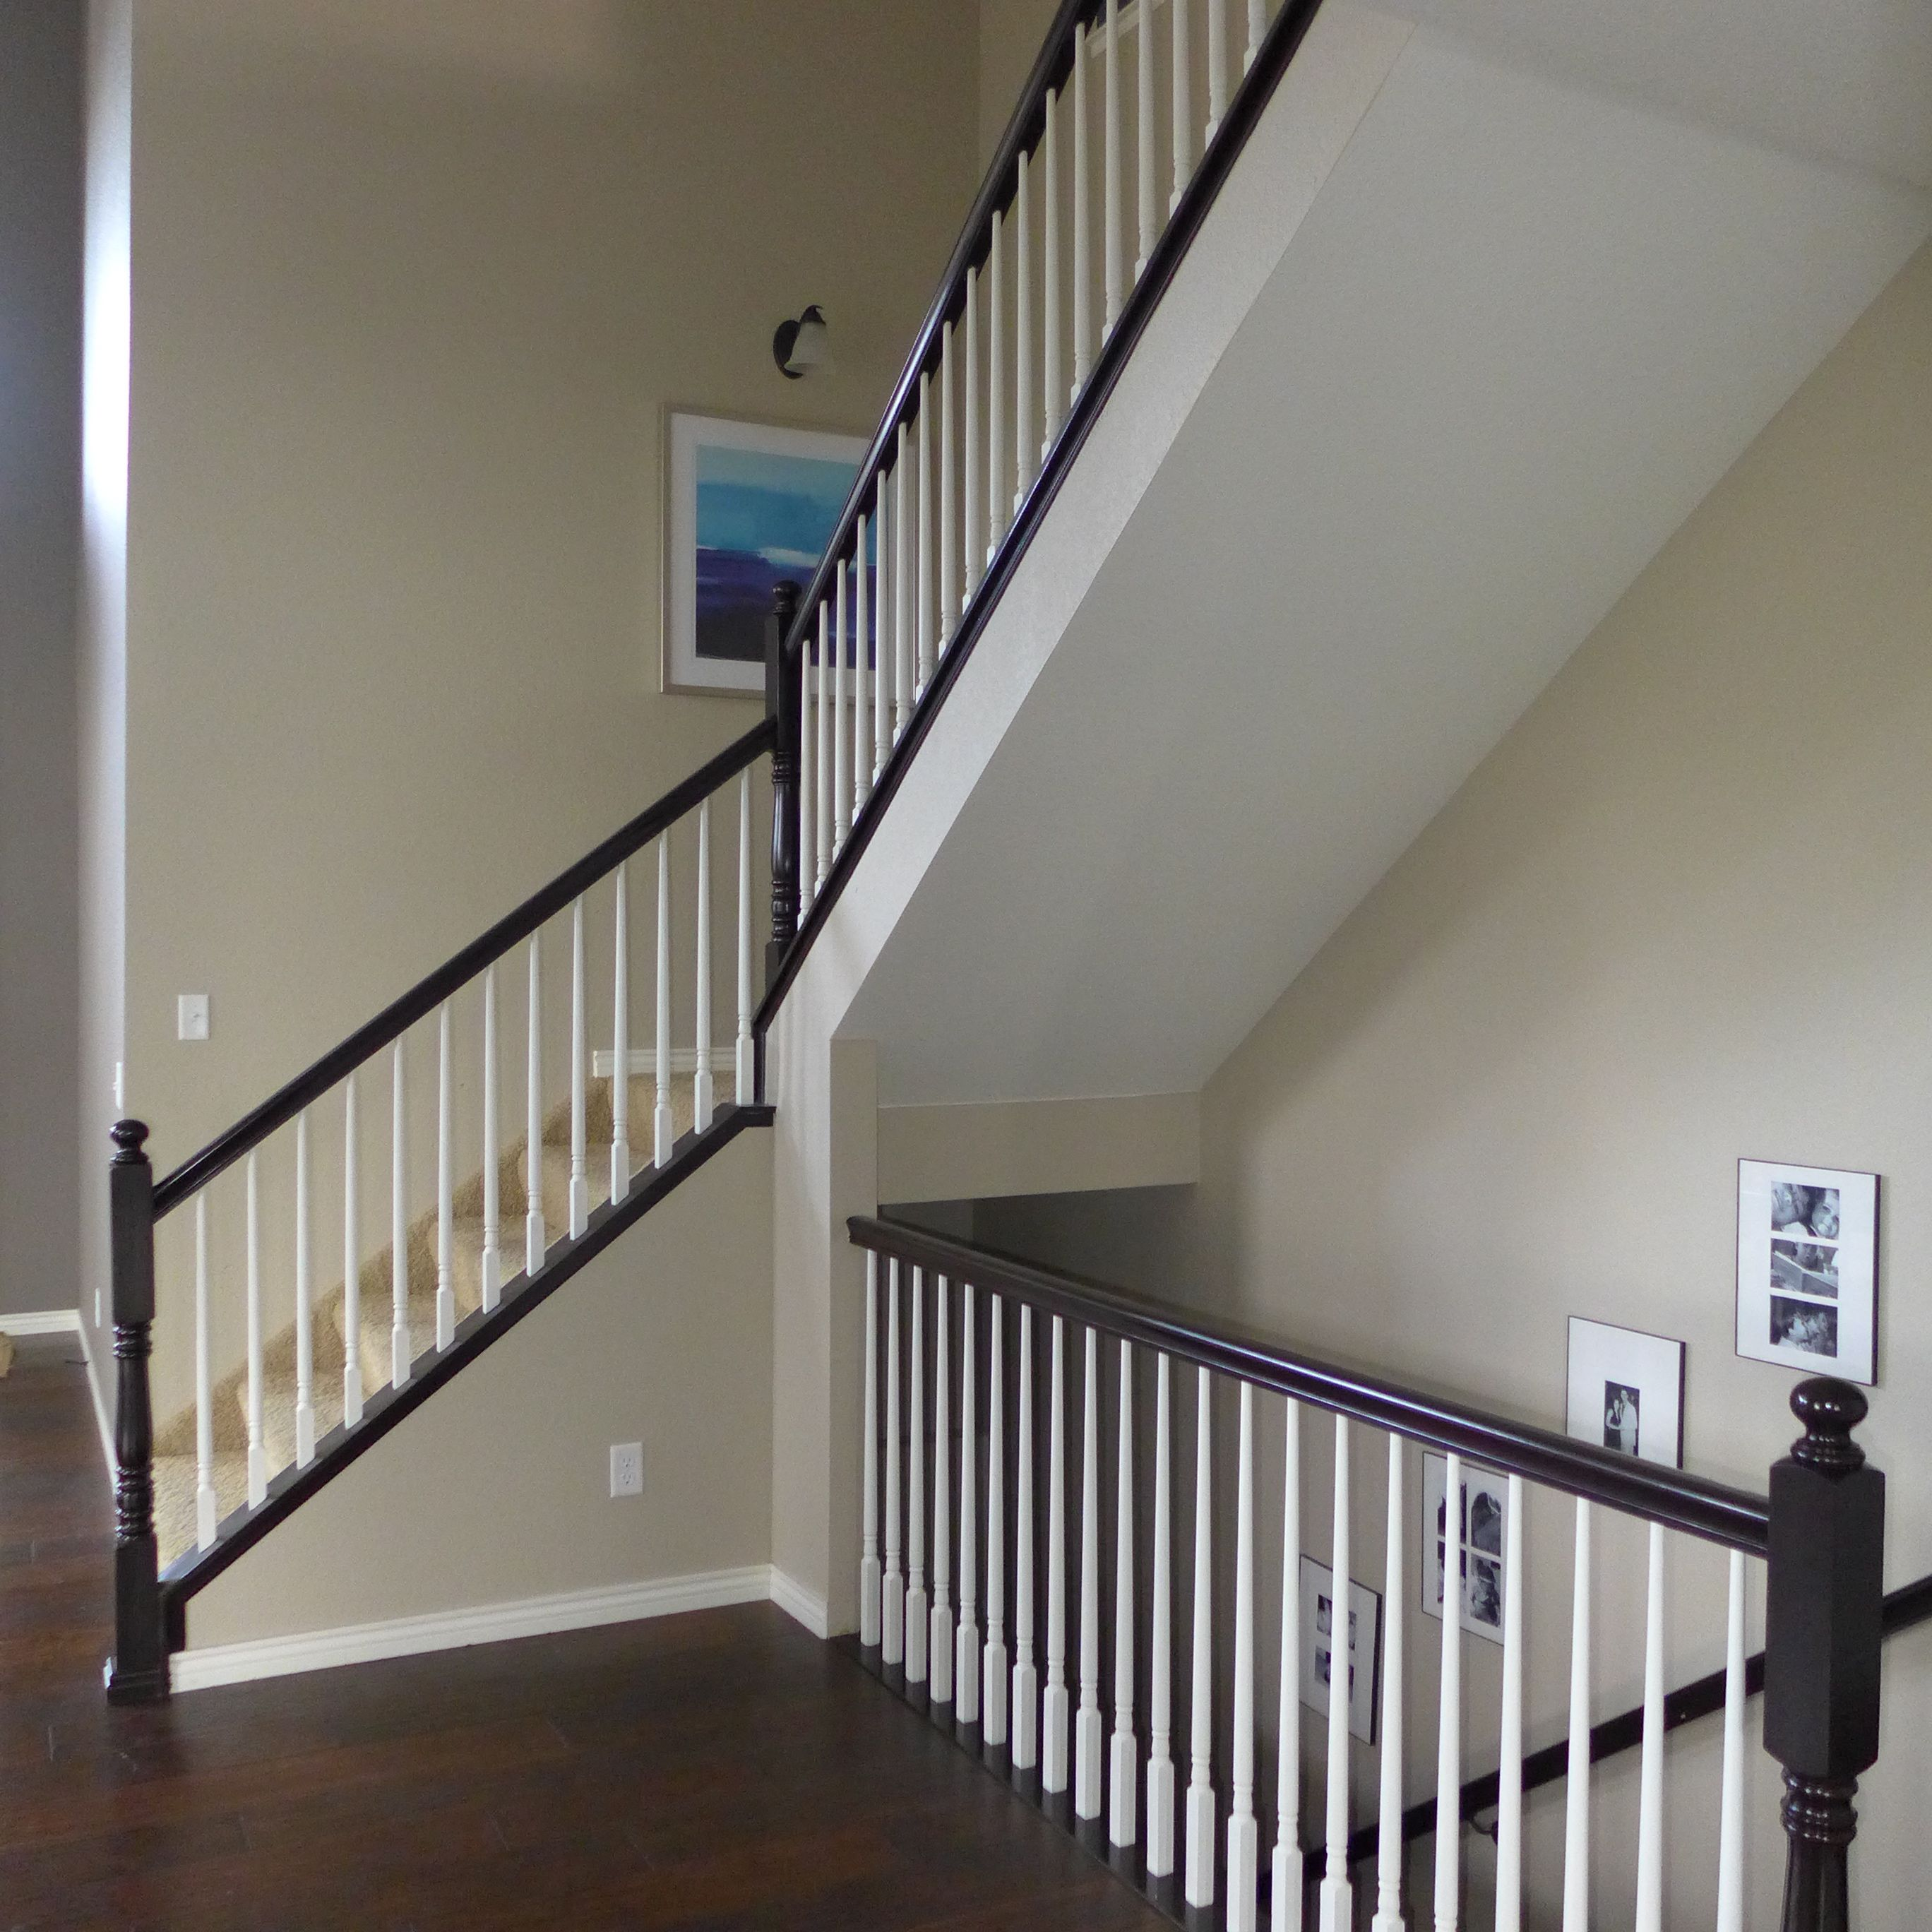 Stair Railing Paint Job Black And White Railing Espresso